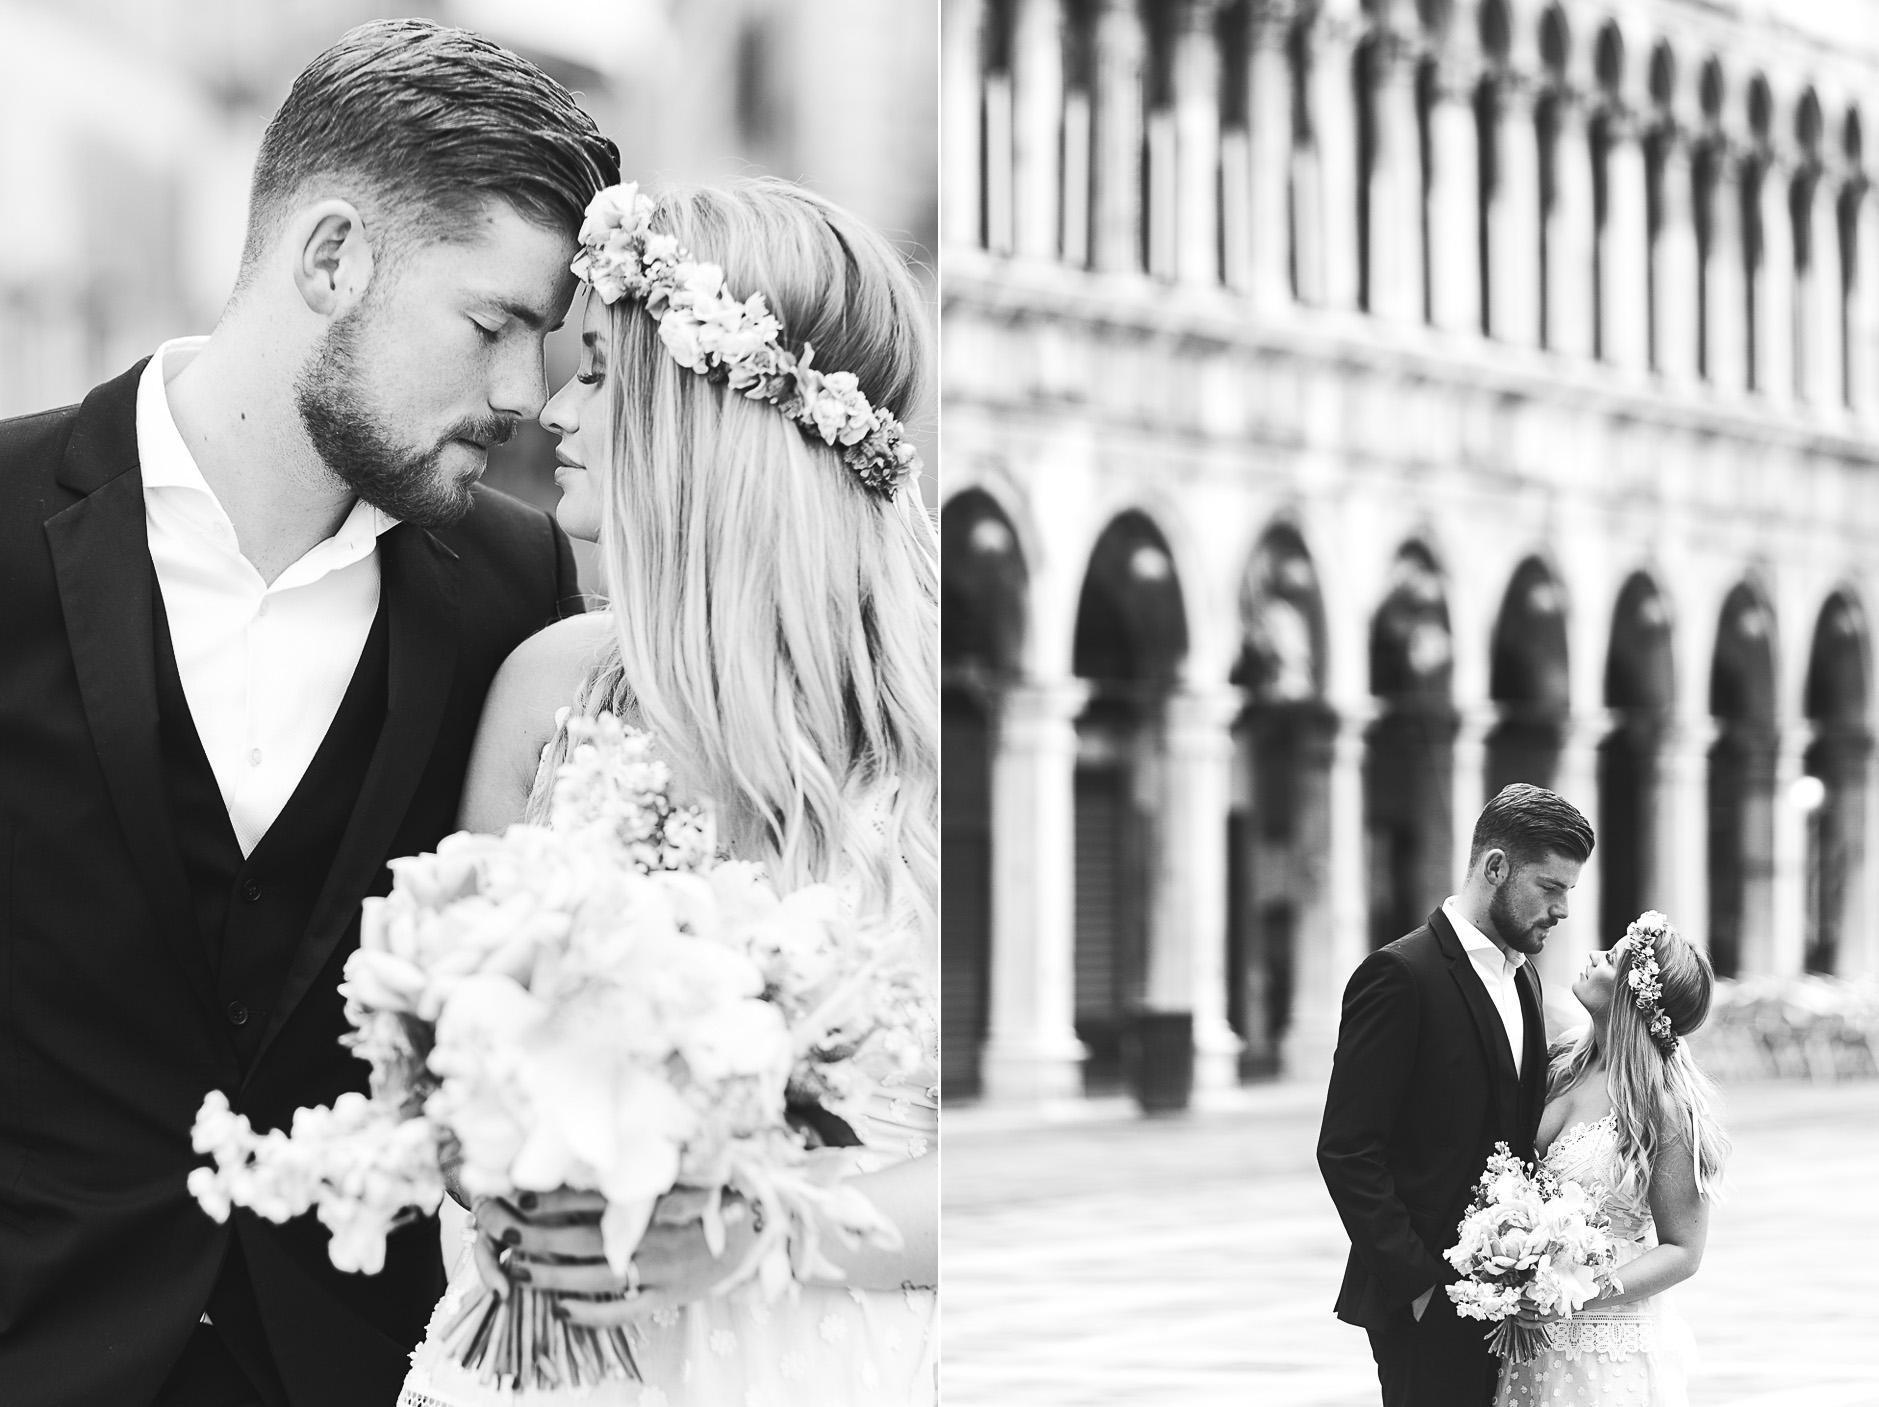 Hochzeitsfotograf Le Hai Linh Boho Chic After Wedding Shooting Venedig Timo Horn 1.FC Koeln 021.jpg